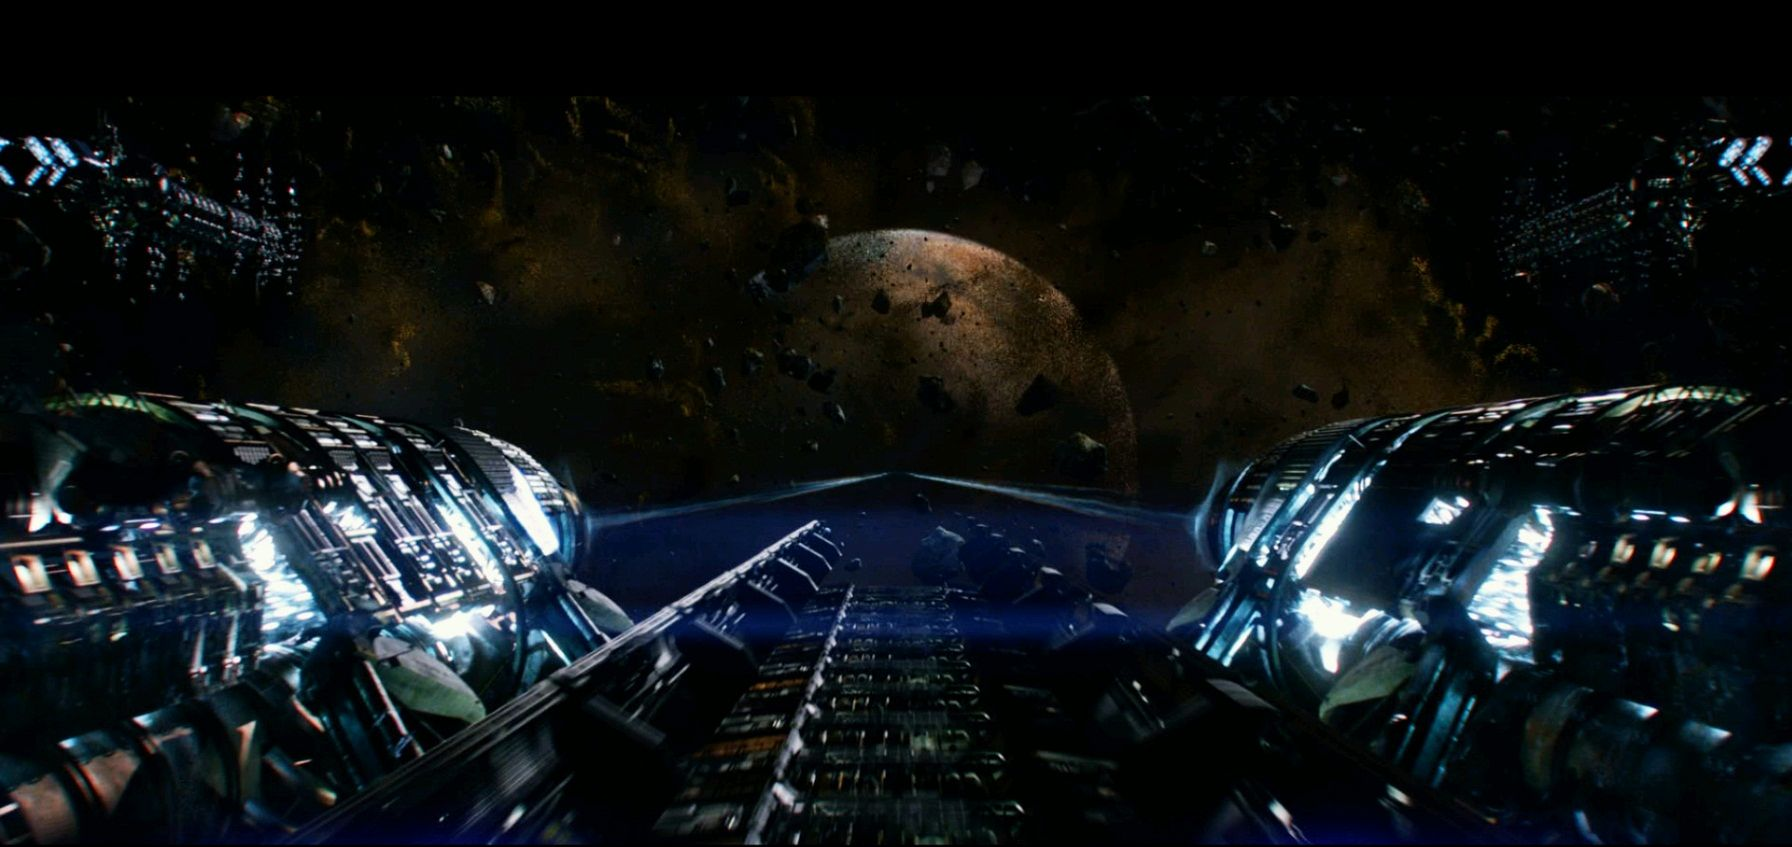 последним убитым фантастика фільми про космос информацию